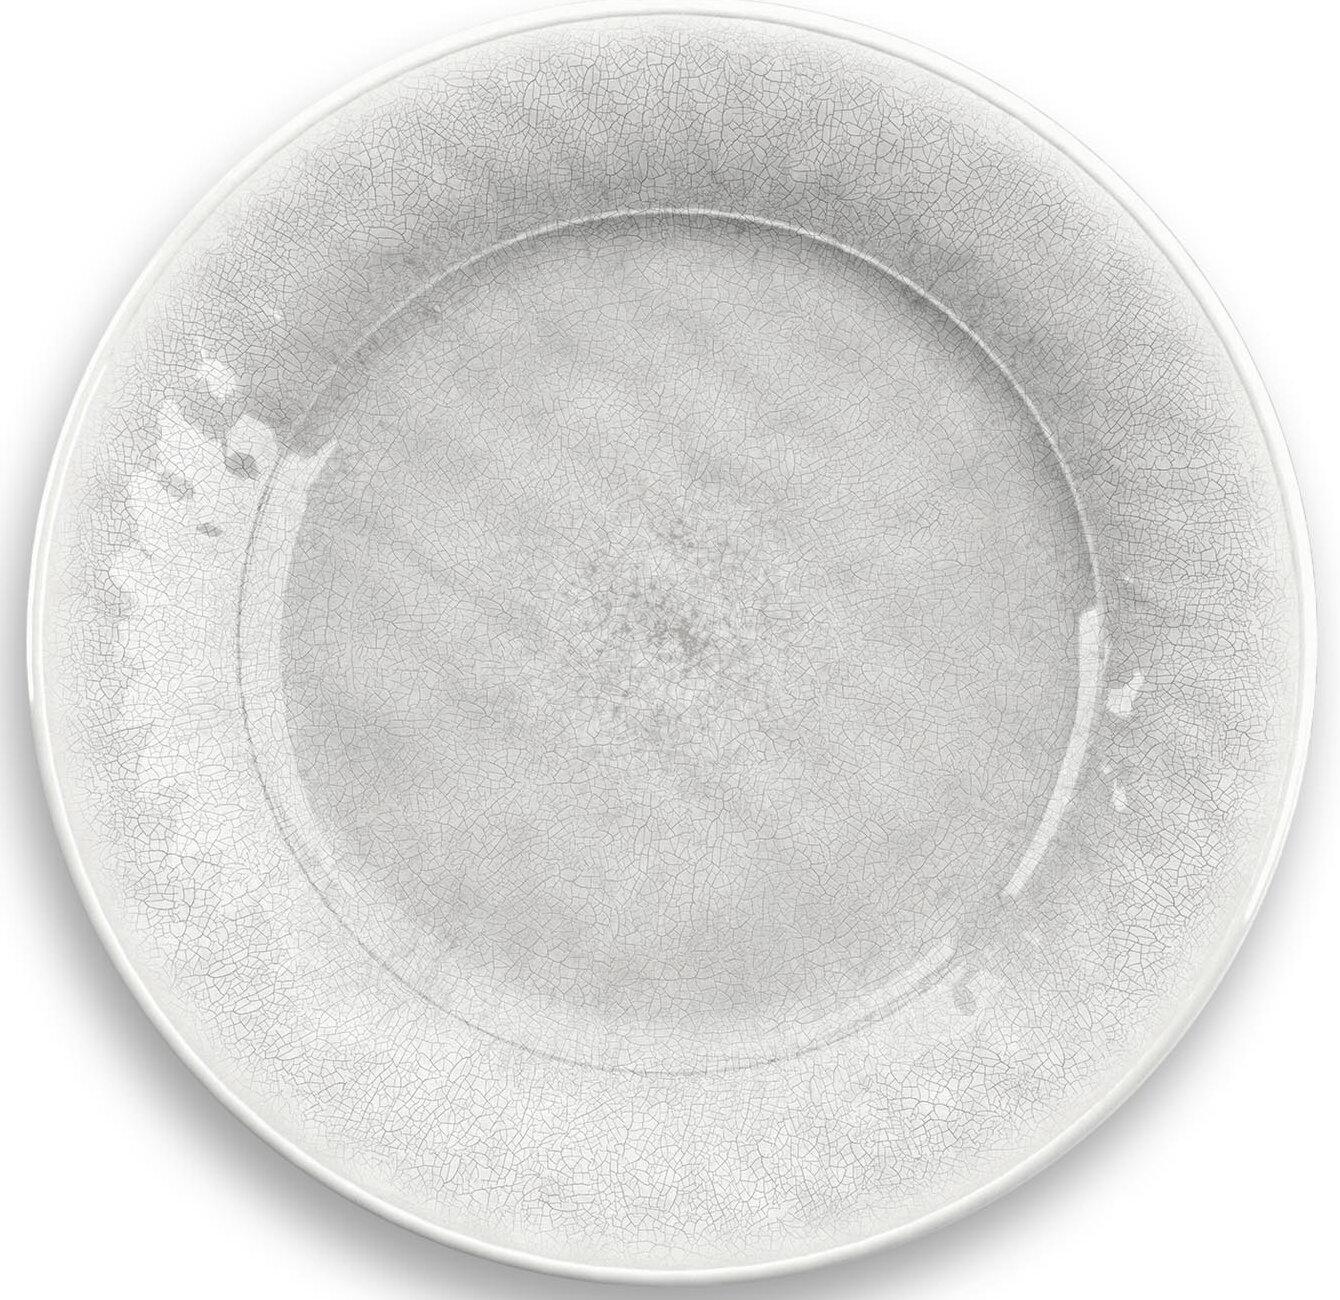 sc 1 st  Wayfair & Mint Pantry Seth Glaze Melamine Dinner Plate u0026 Reviews | Wayfair